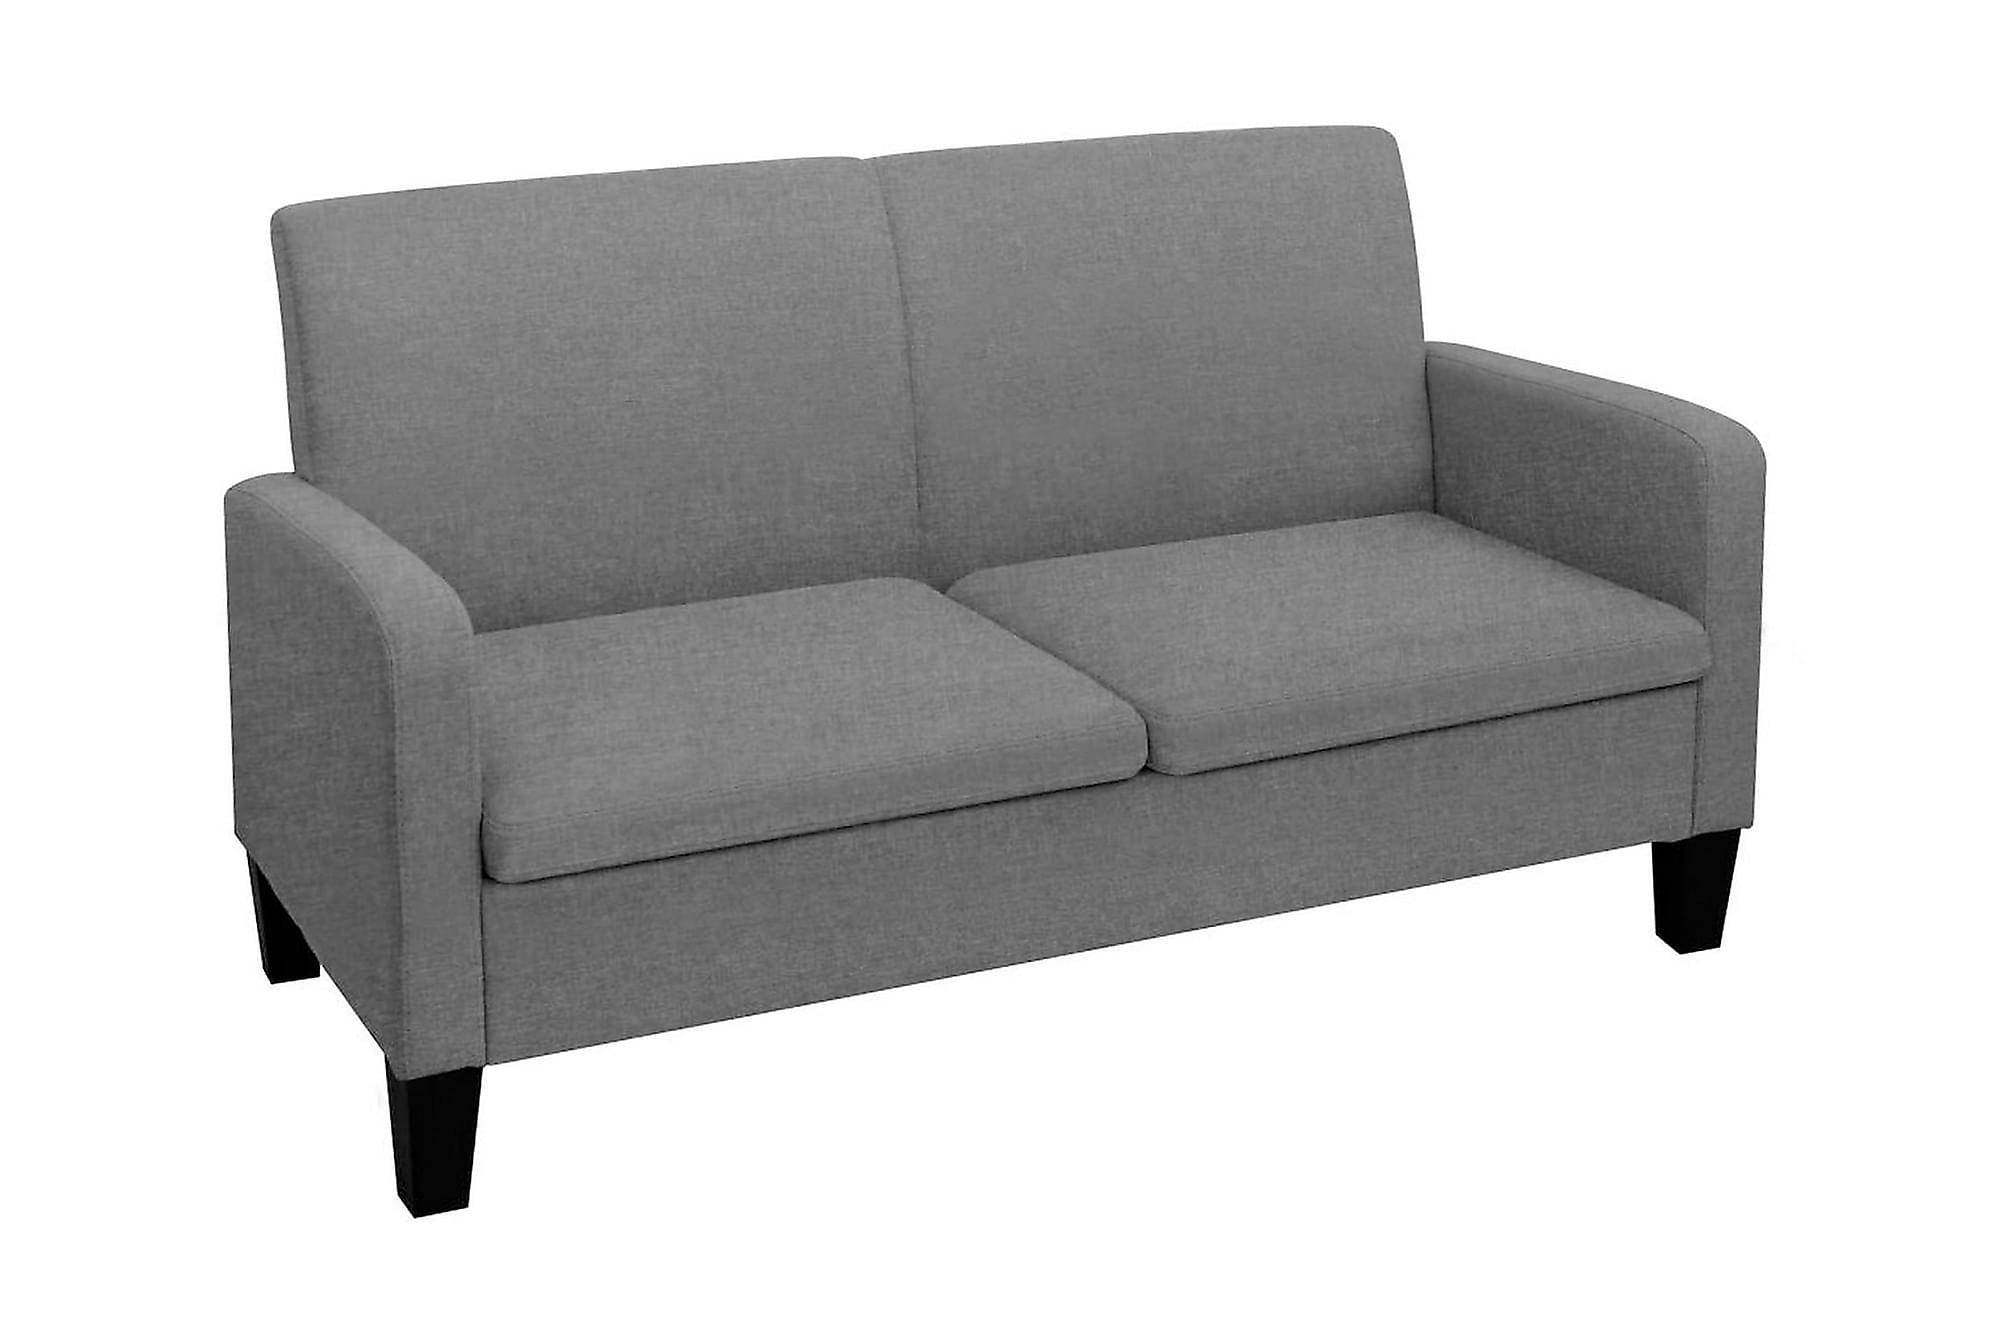 2-sitssoffa 135x65x76 cm mörkgrå, 2-sits soffor